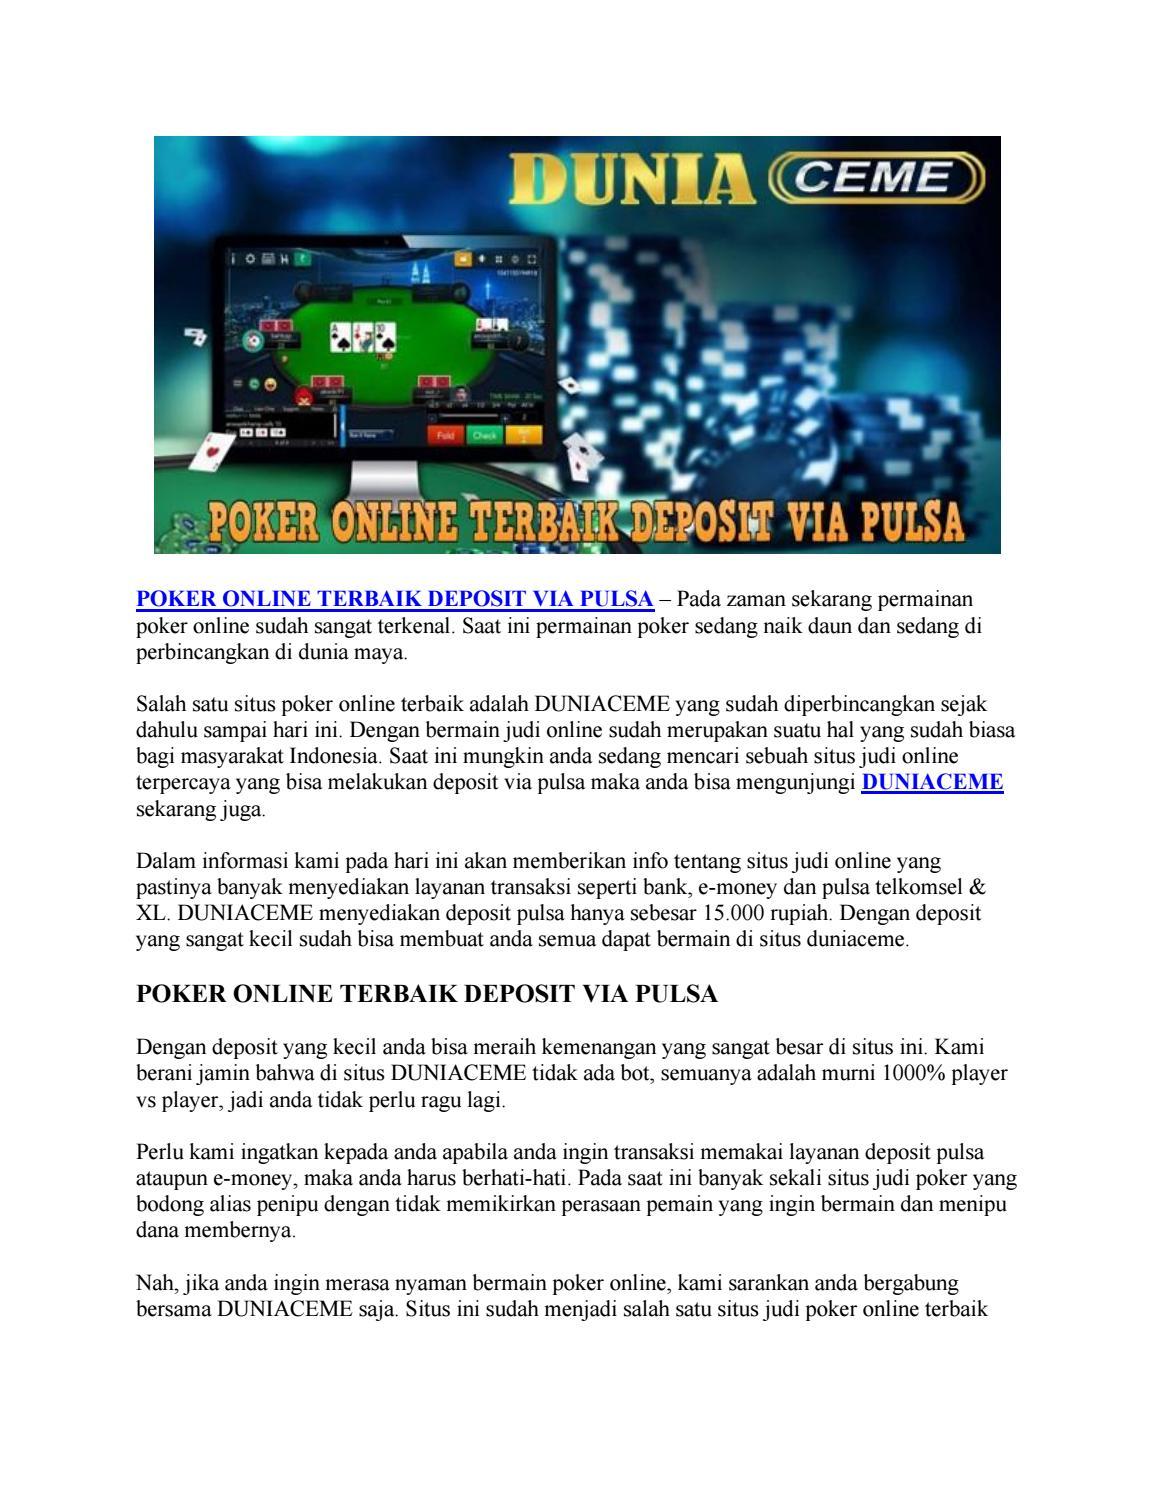 Poker Online Terbaik Deposit Via Pulsa By Pulsa Idnpoker Issuu